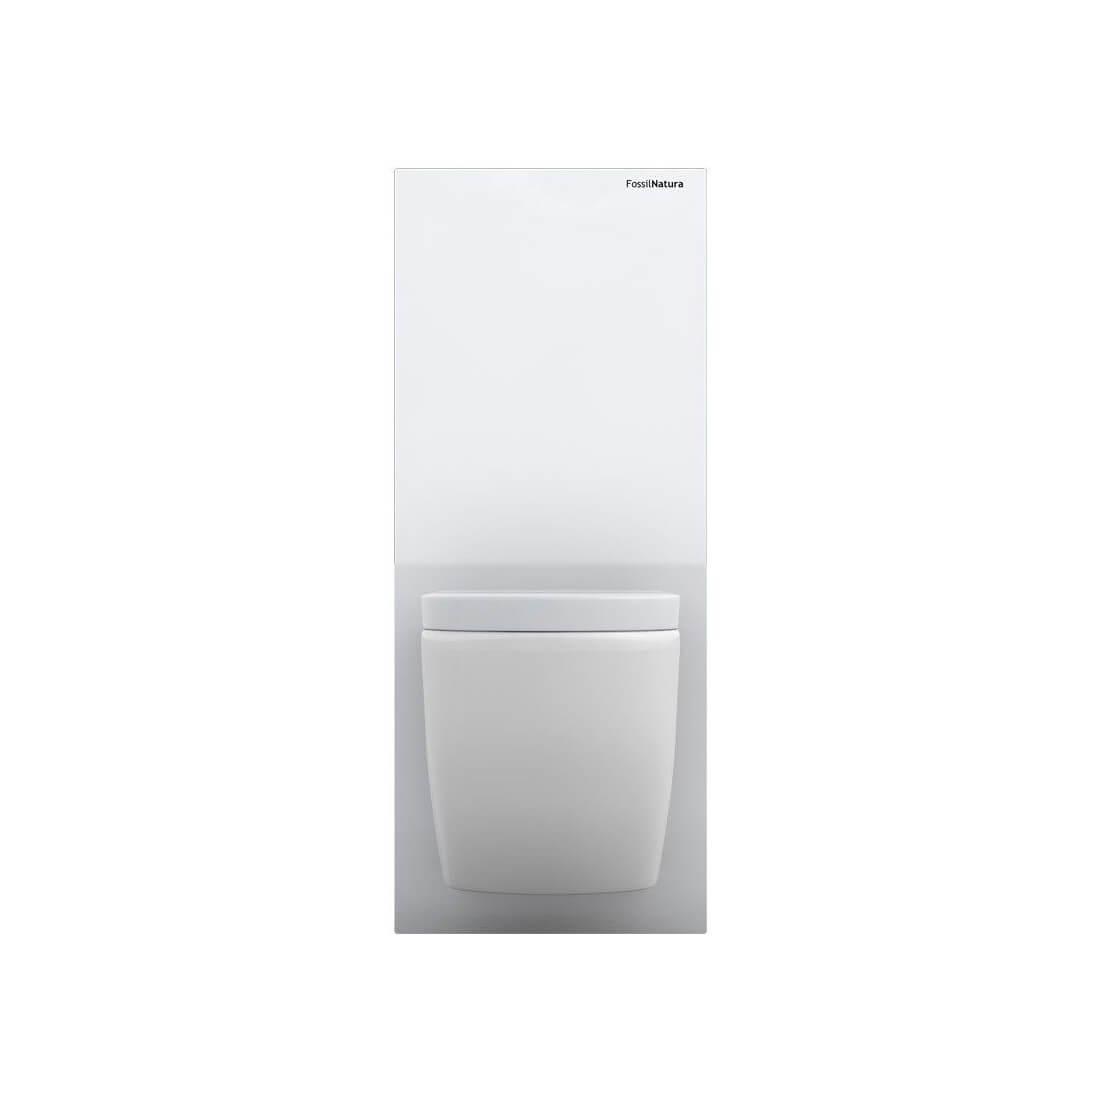 ▷ Cisterna vista suspendida Empire White para inodoros suspendidos.